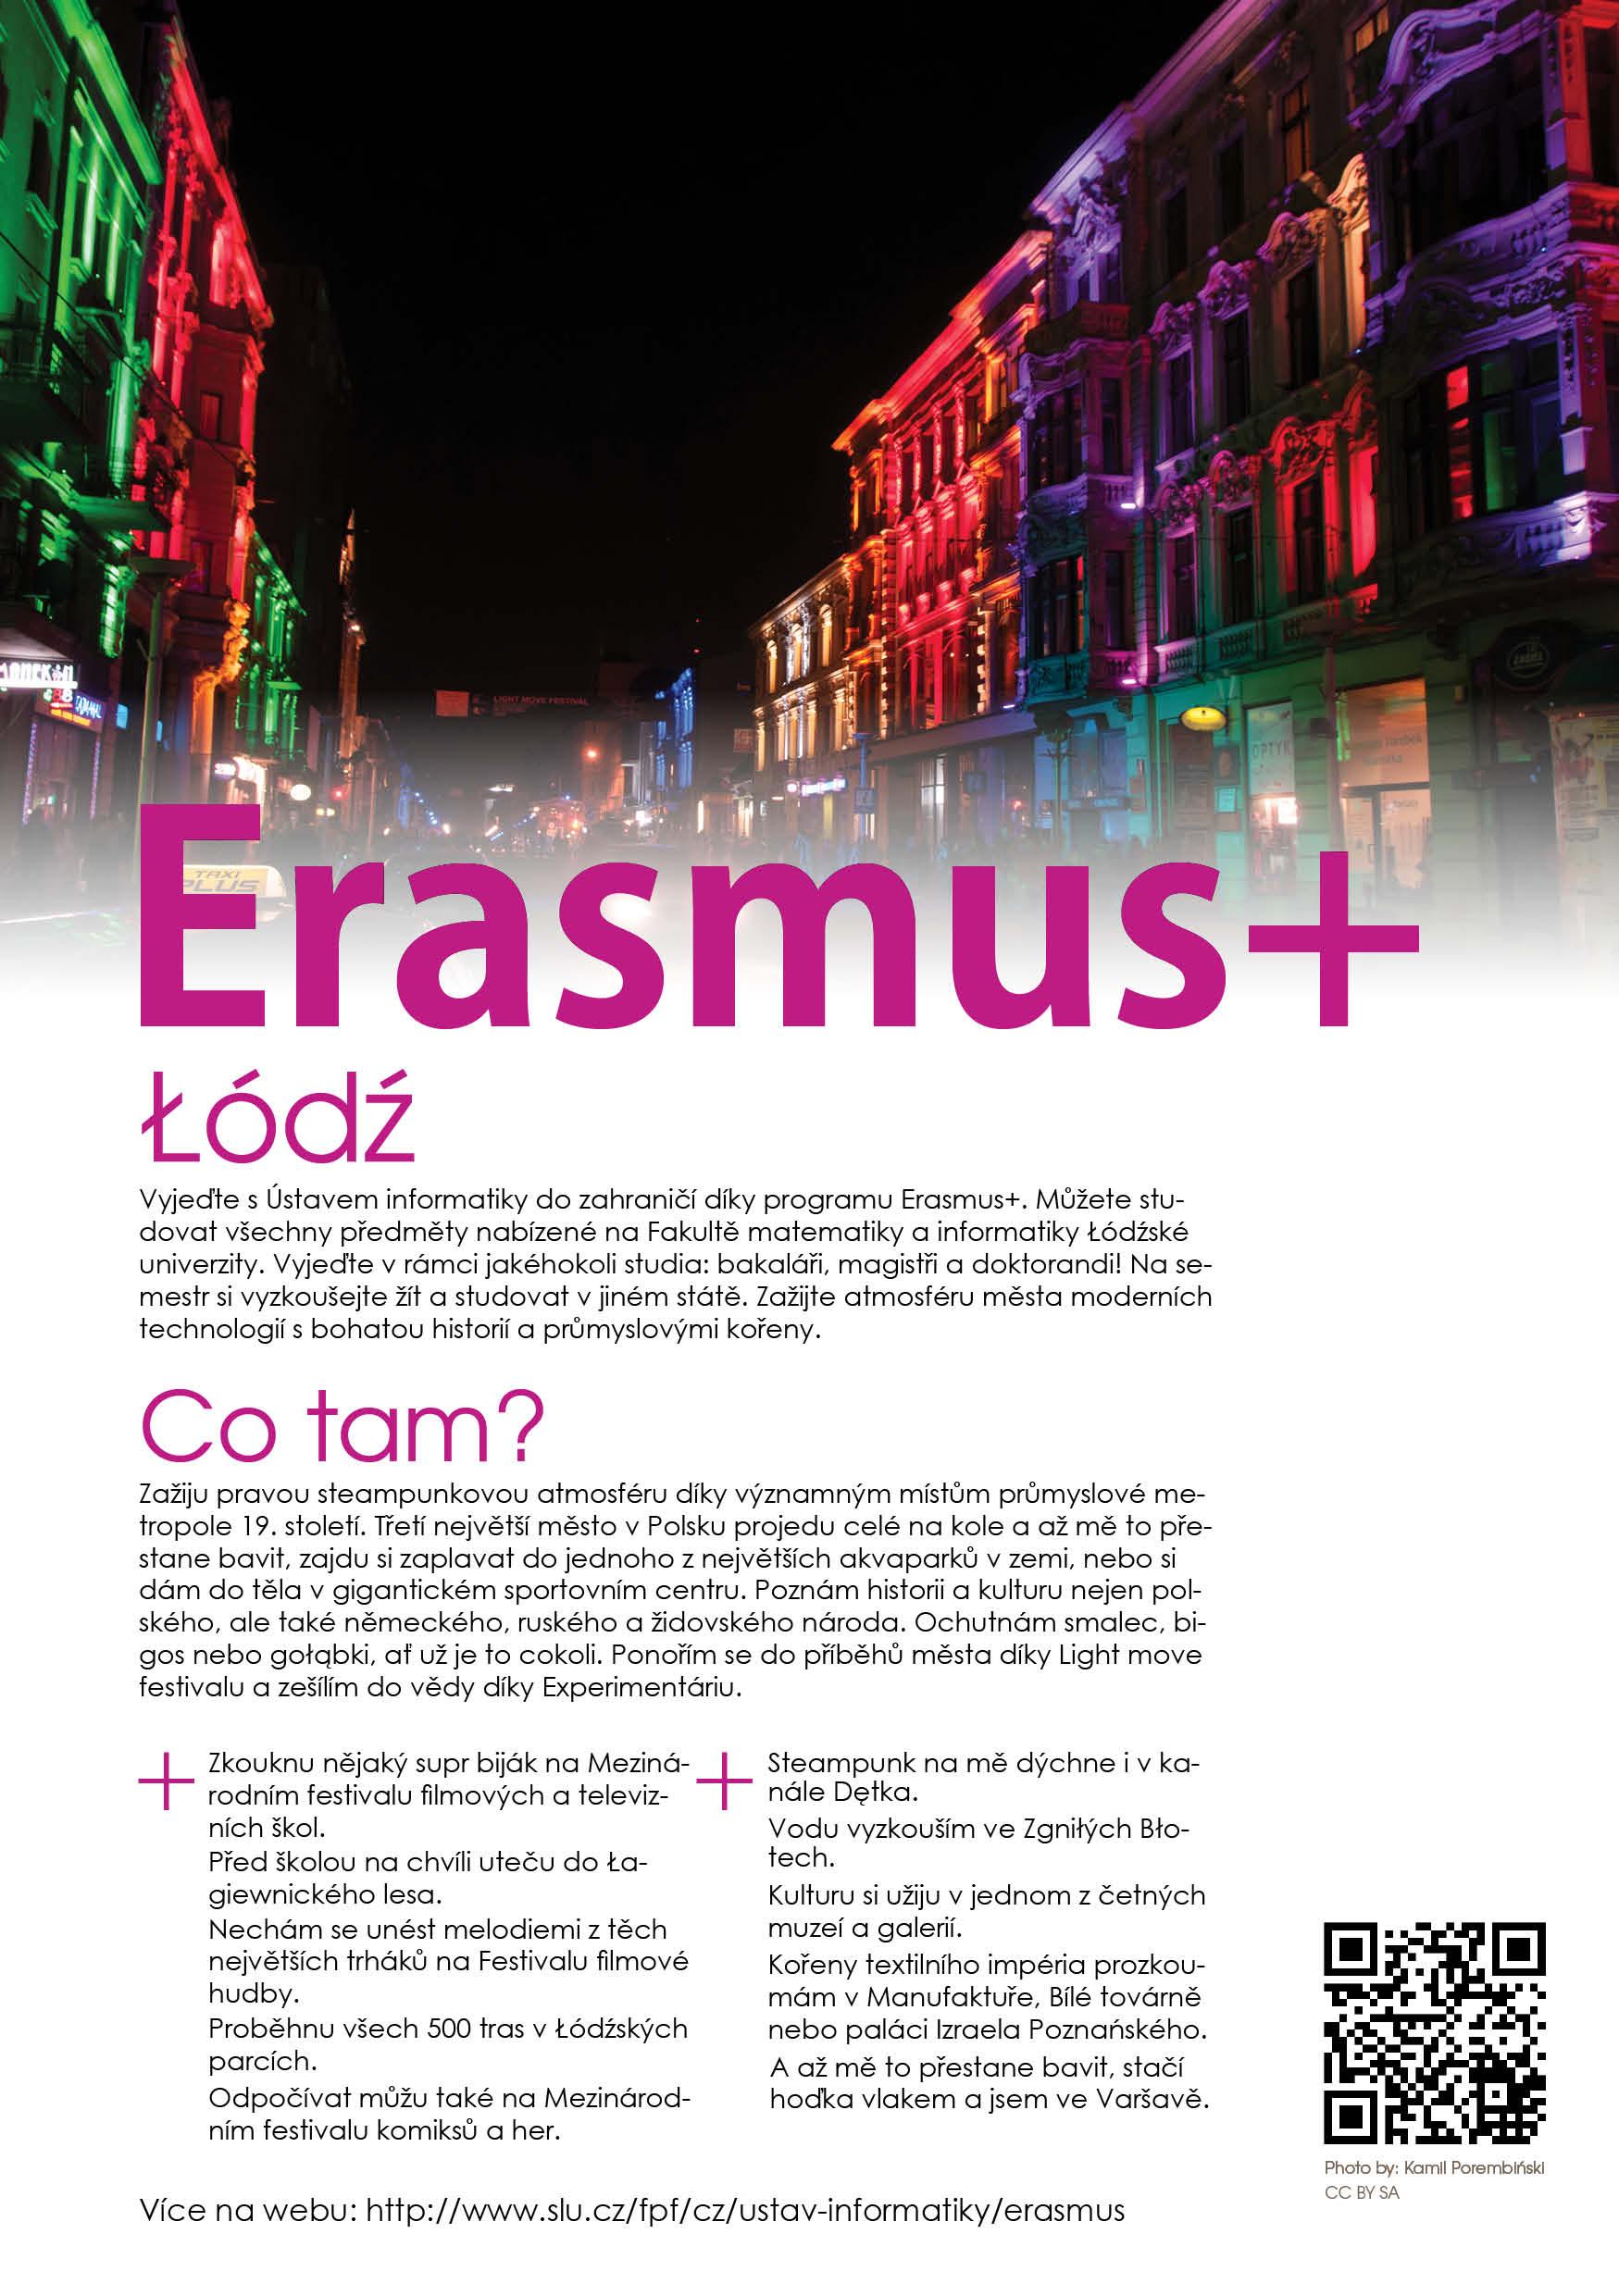 Erasmus - Lódź